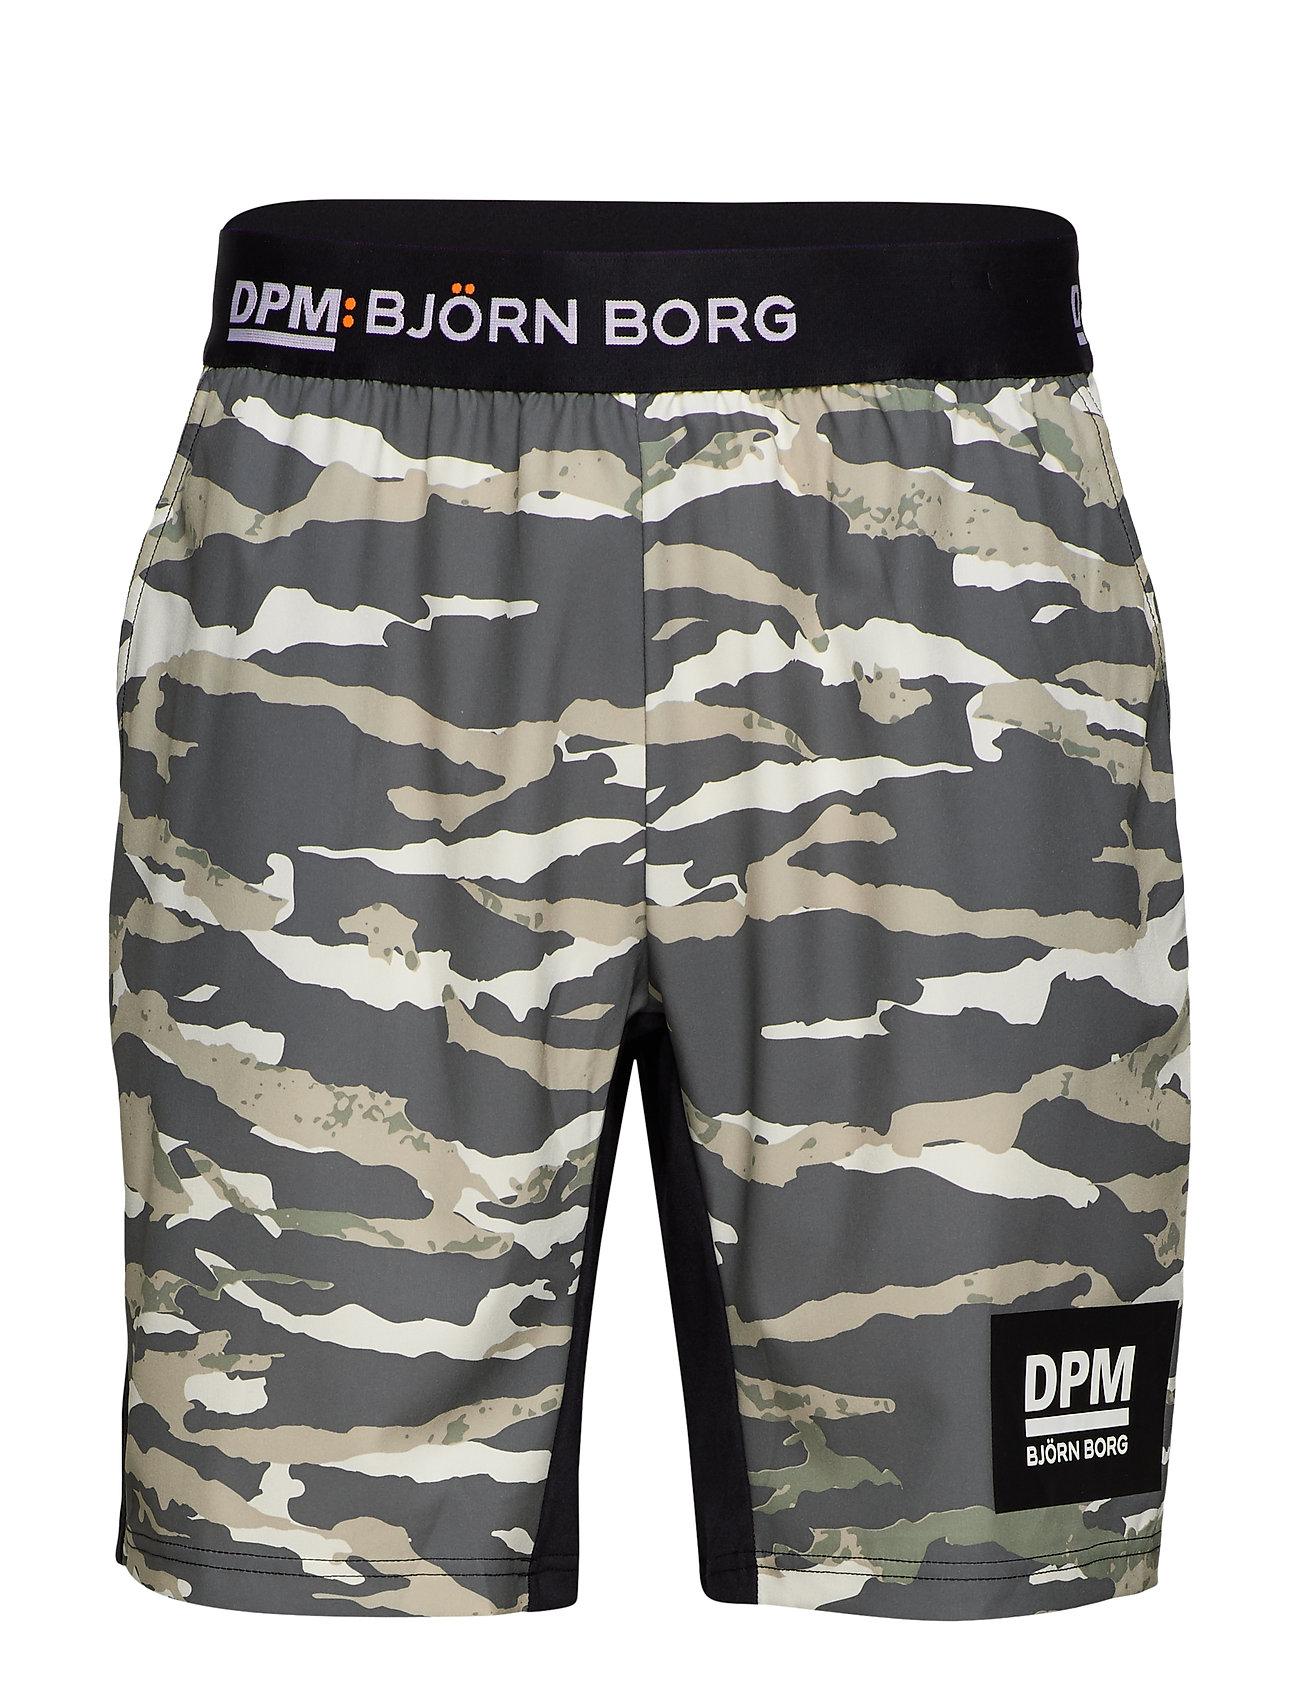 Björn Borg AUGUST SHORTS - TIGERSTRIPE MURALE JUNGLE